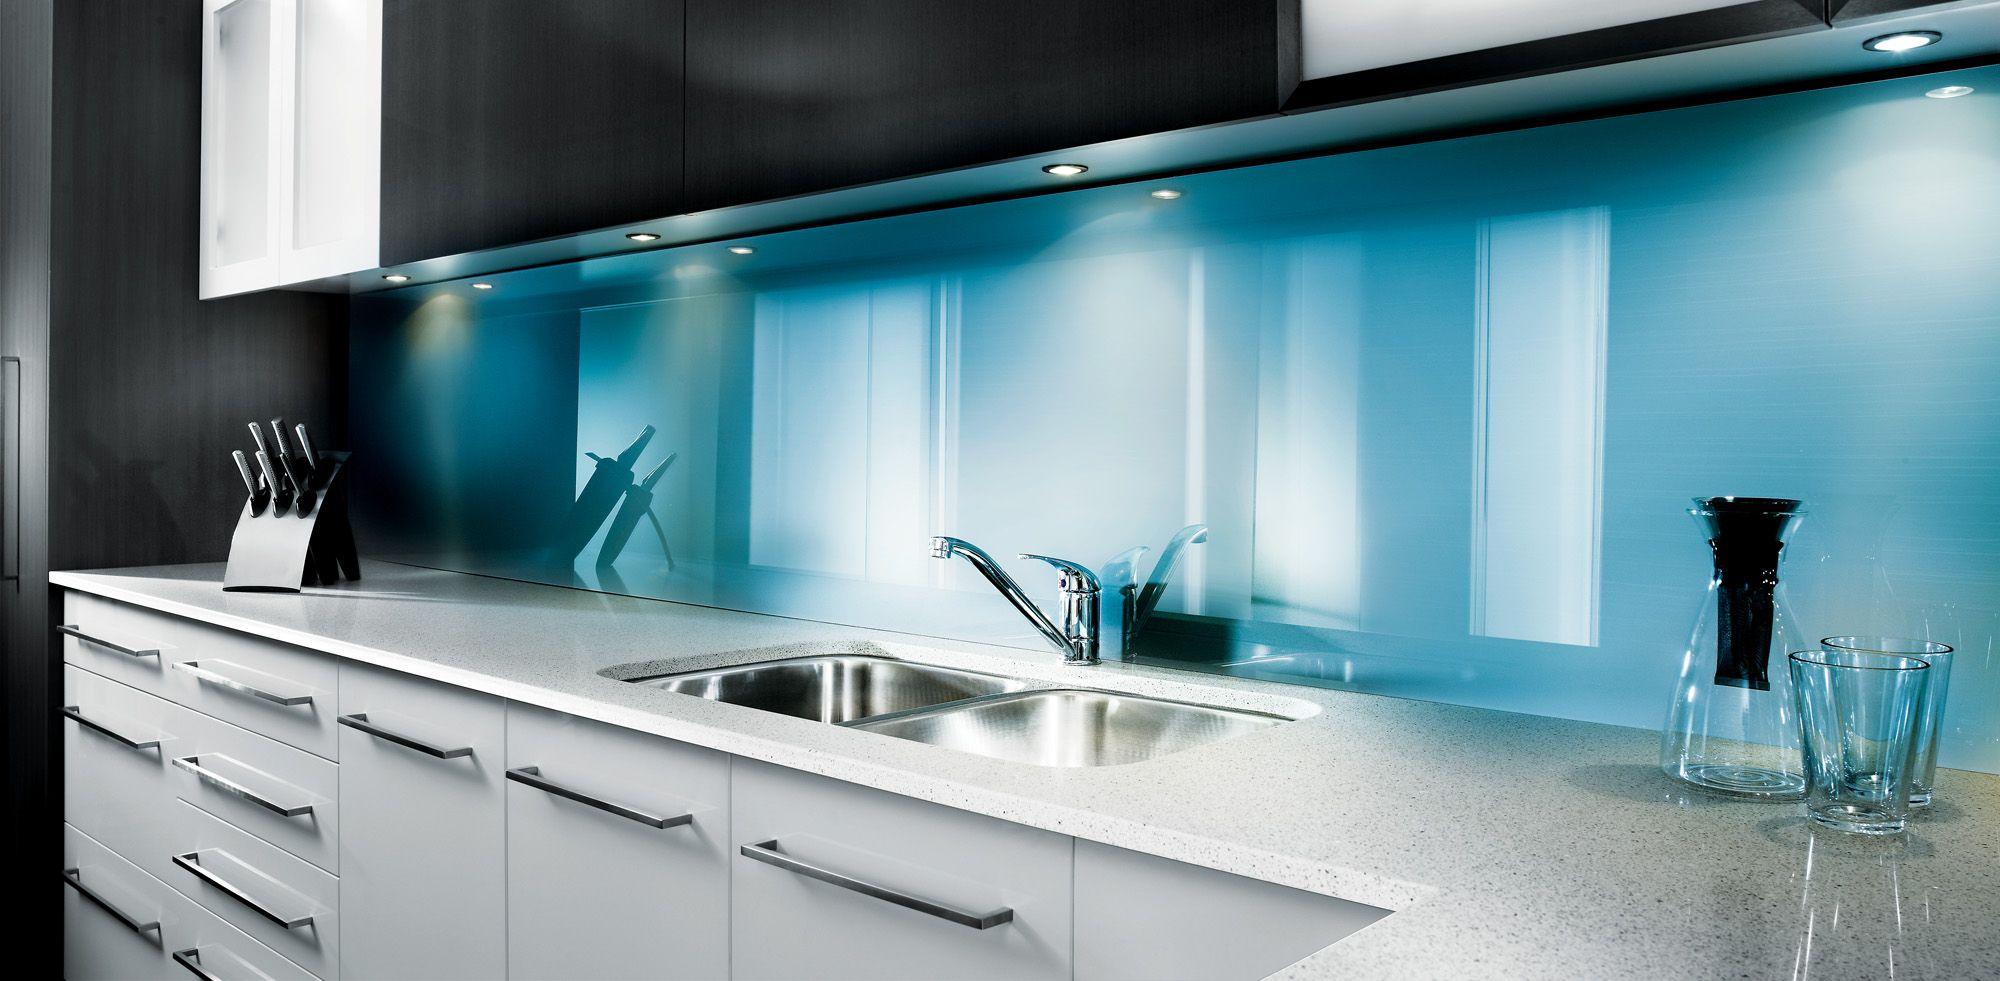 kitchen whiteboard teal chairs lustrolite blue atoll slab architecturalceramics